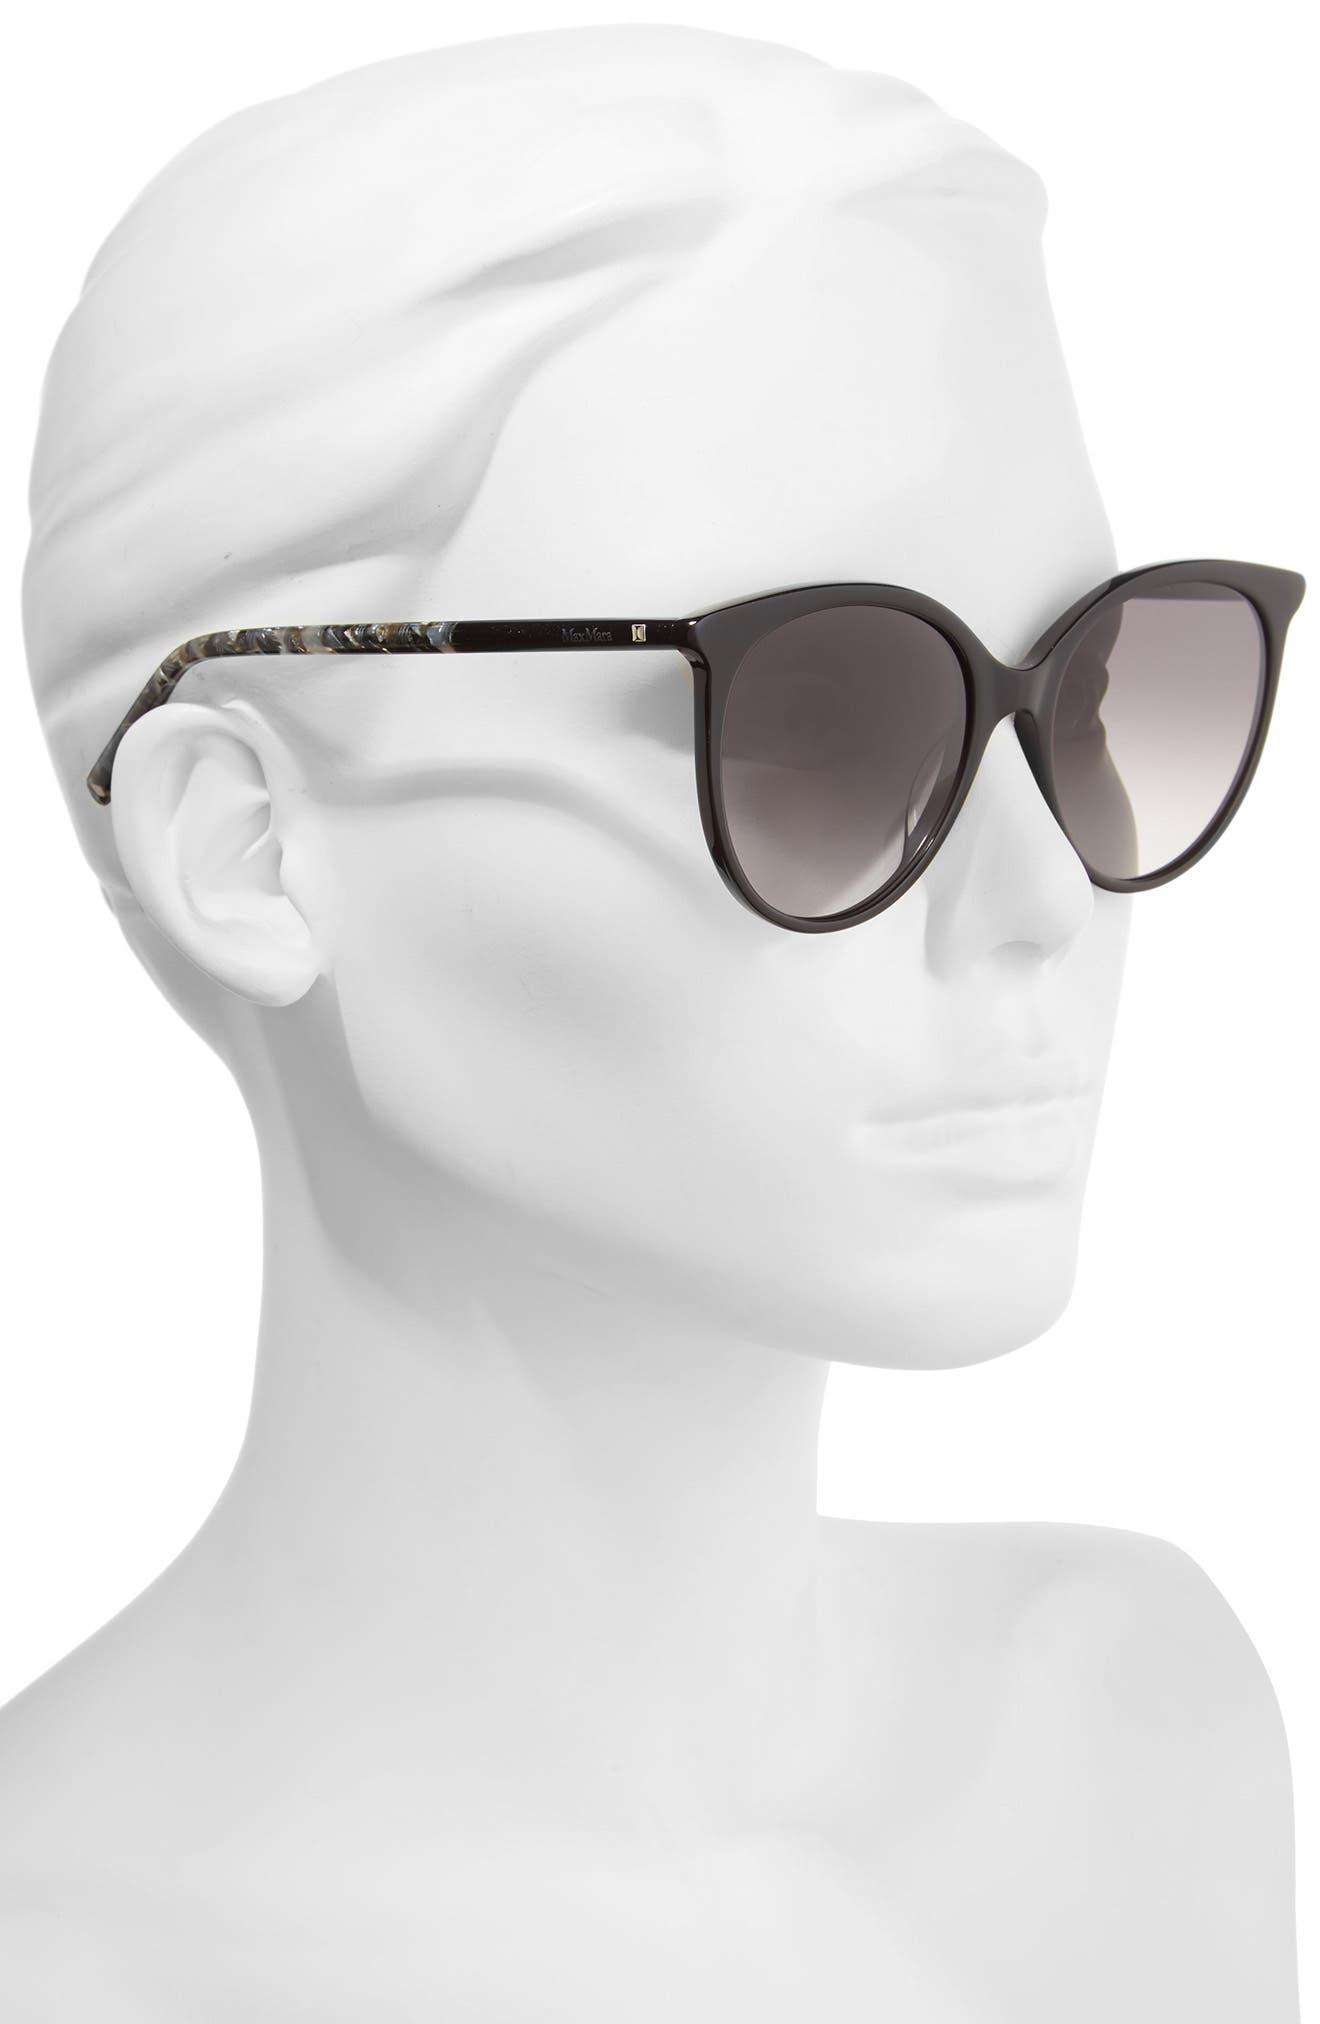 Alternate Image 2  - Max Mara Tube 54mm Gradient Lens Cat Eye Sunglasses